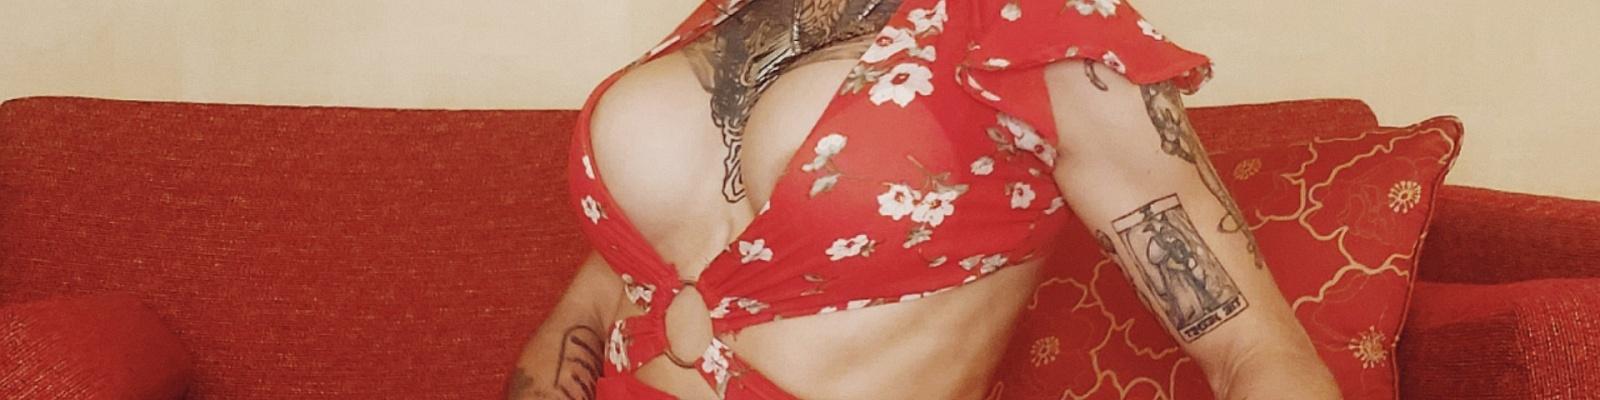 Bree Daniels's Cover Photo